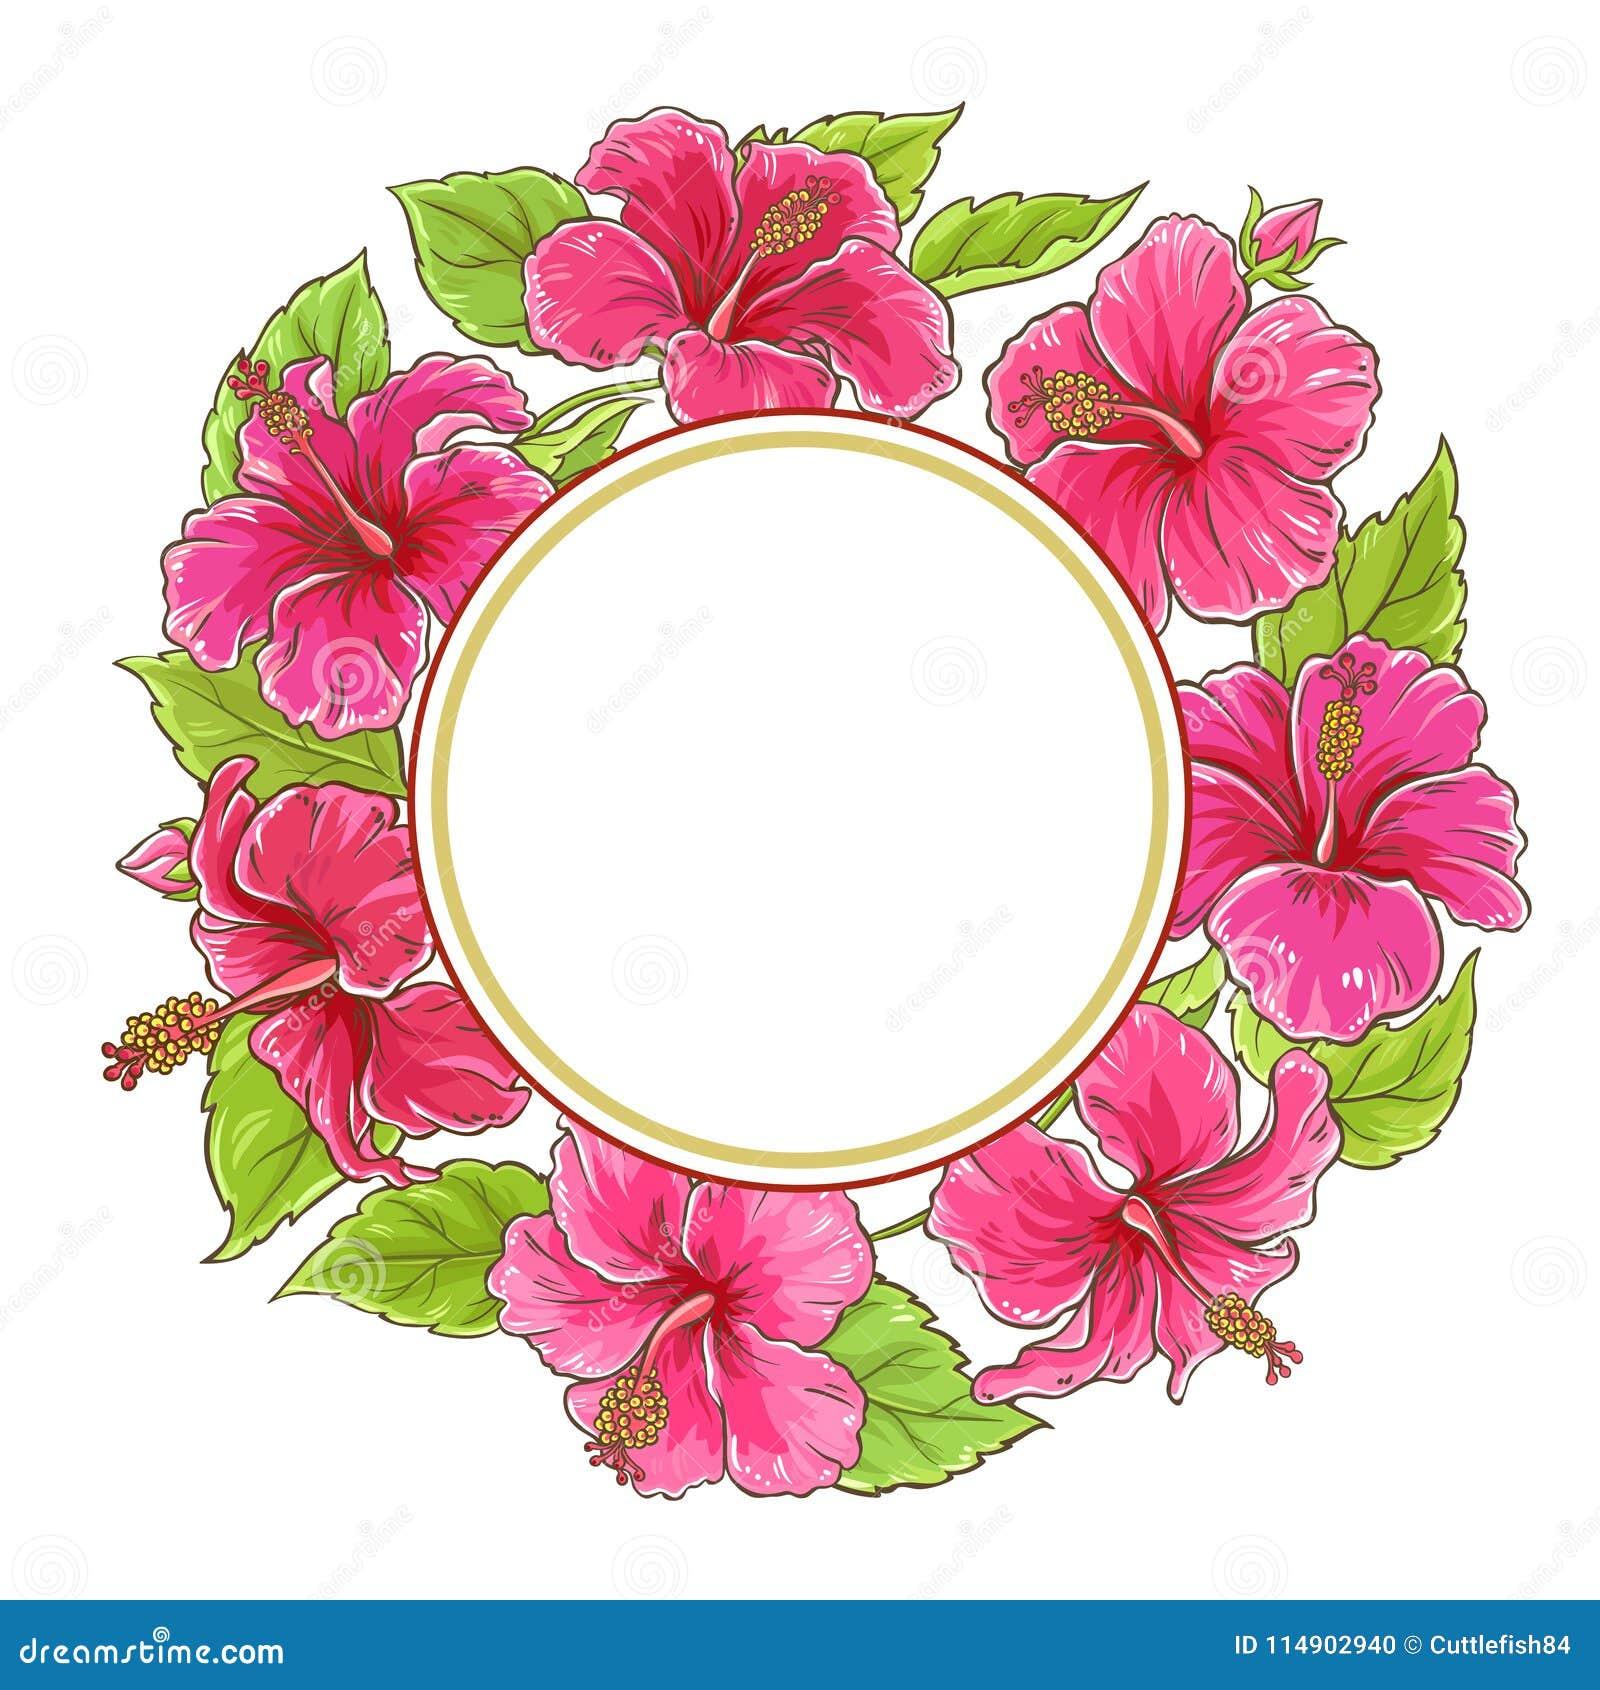 Hibiscus Vector Frame Stock Vector Illustration Of Cartoon 114902940